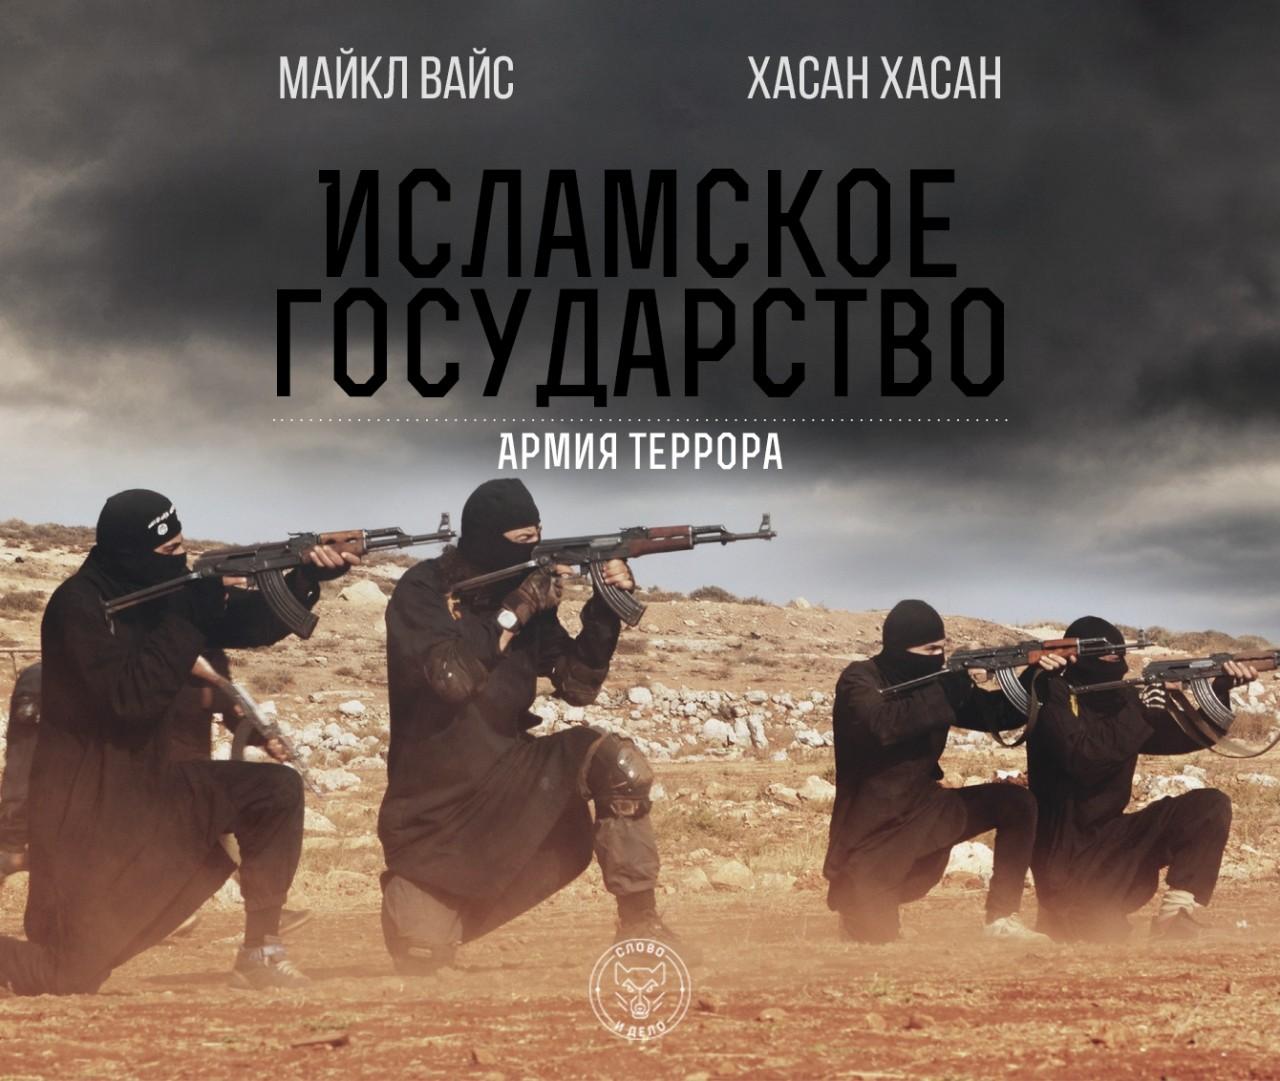 Майкл Вайс, Хасан Хасан «Исламское государство. Армия террора»